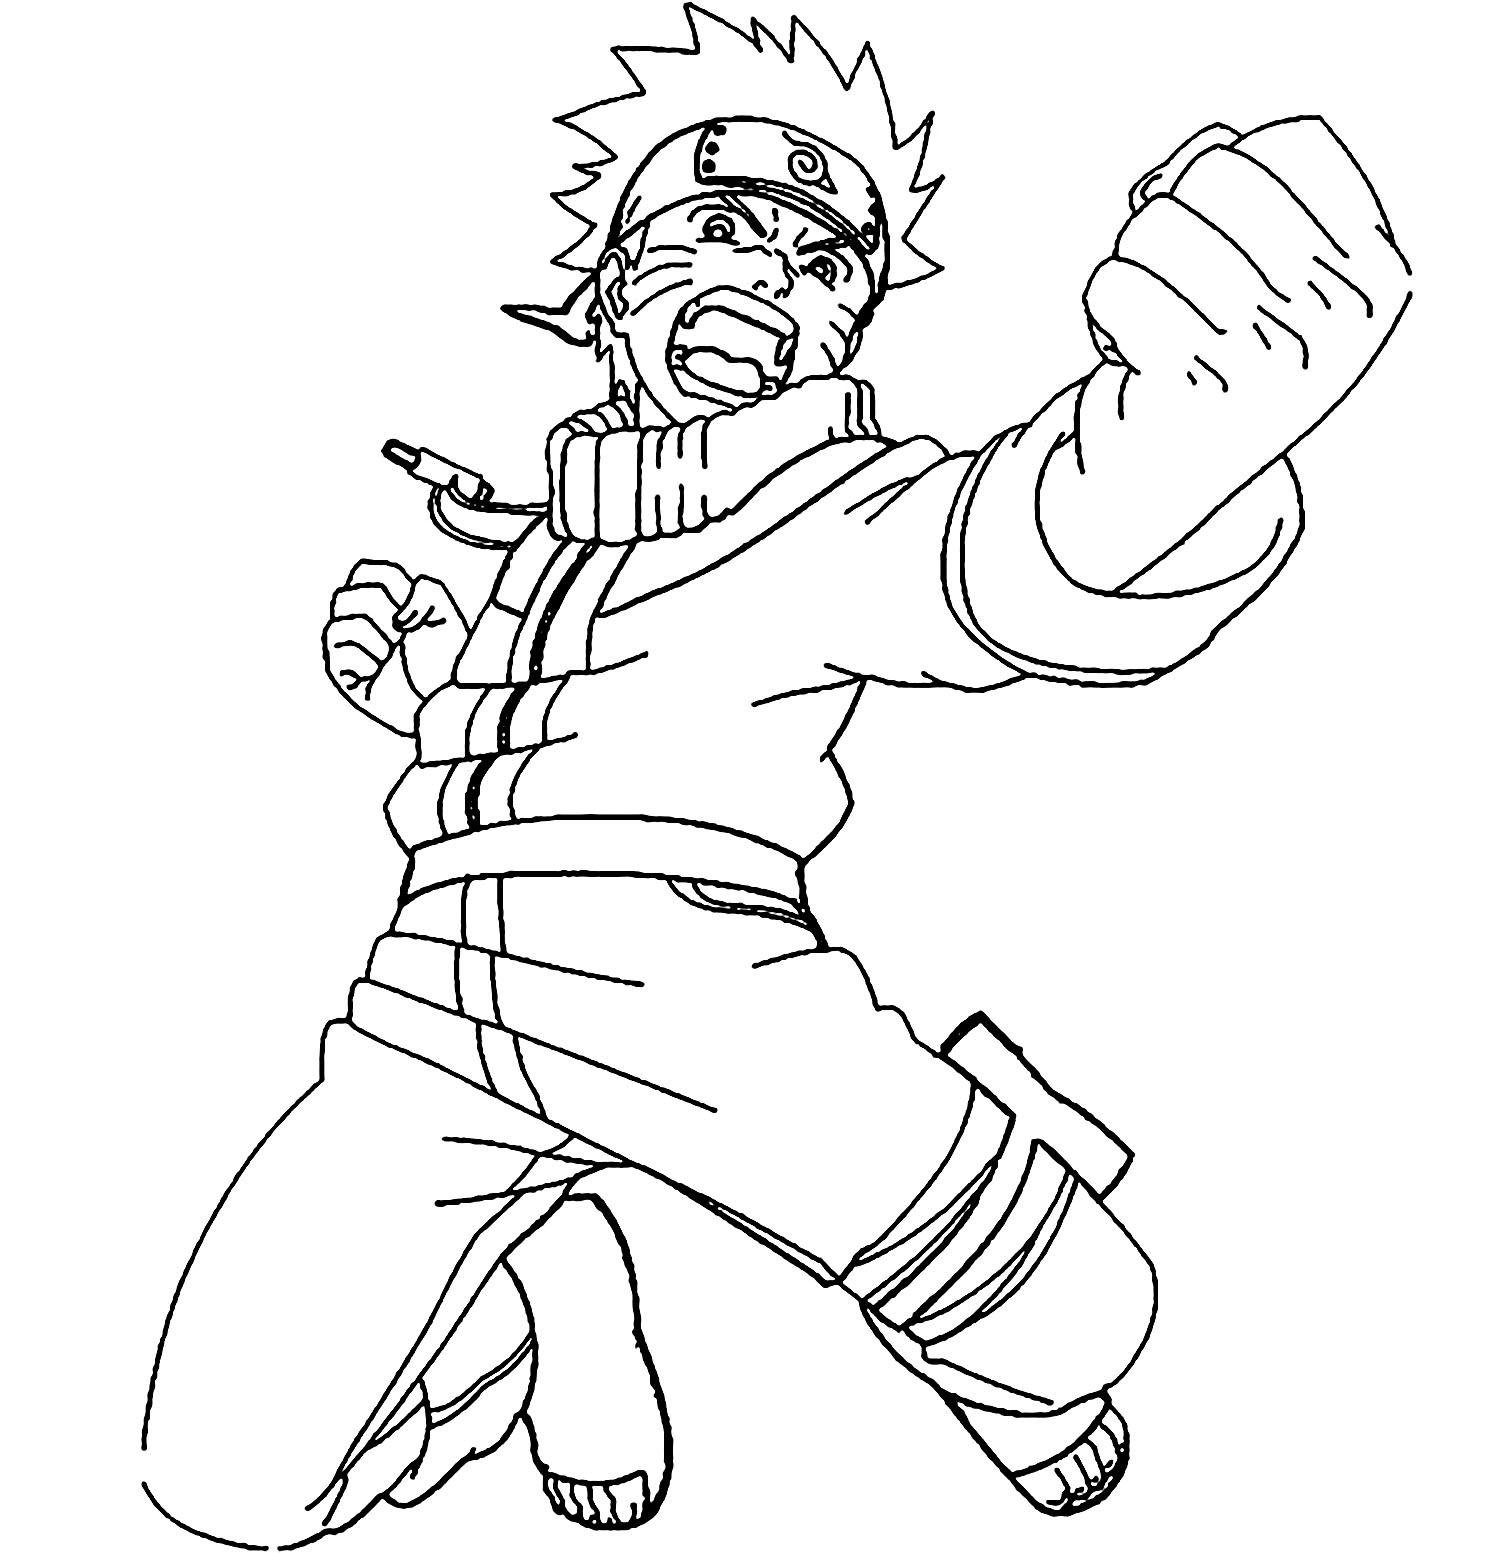 Naruto en action - Coloriage Naruto - Coloriages pour enfants